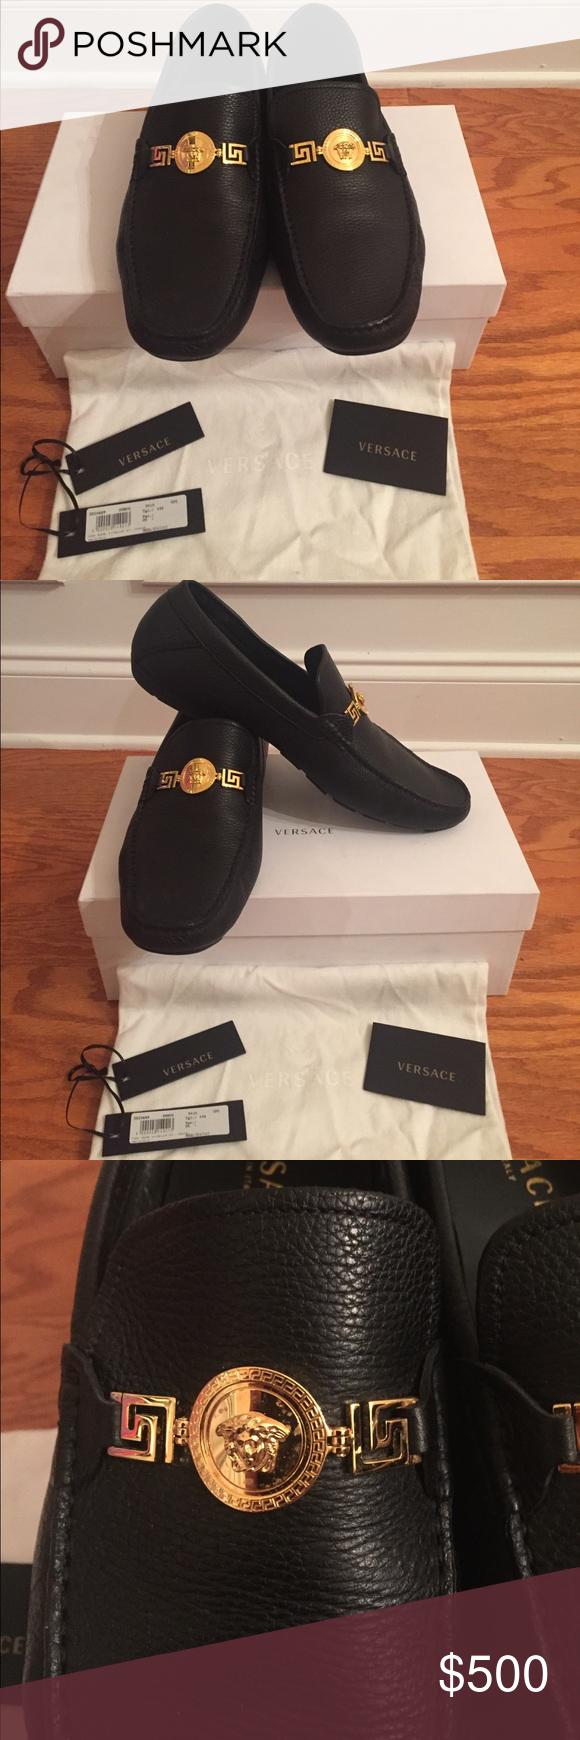 Versace men's shoe size 45 European 11